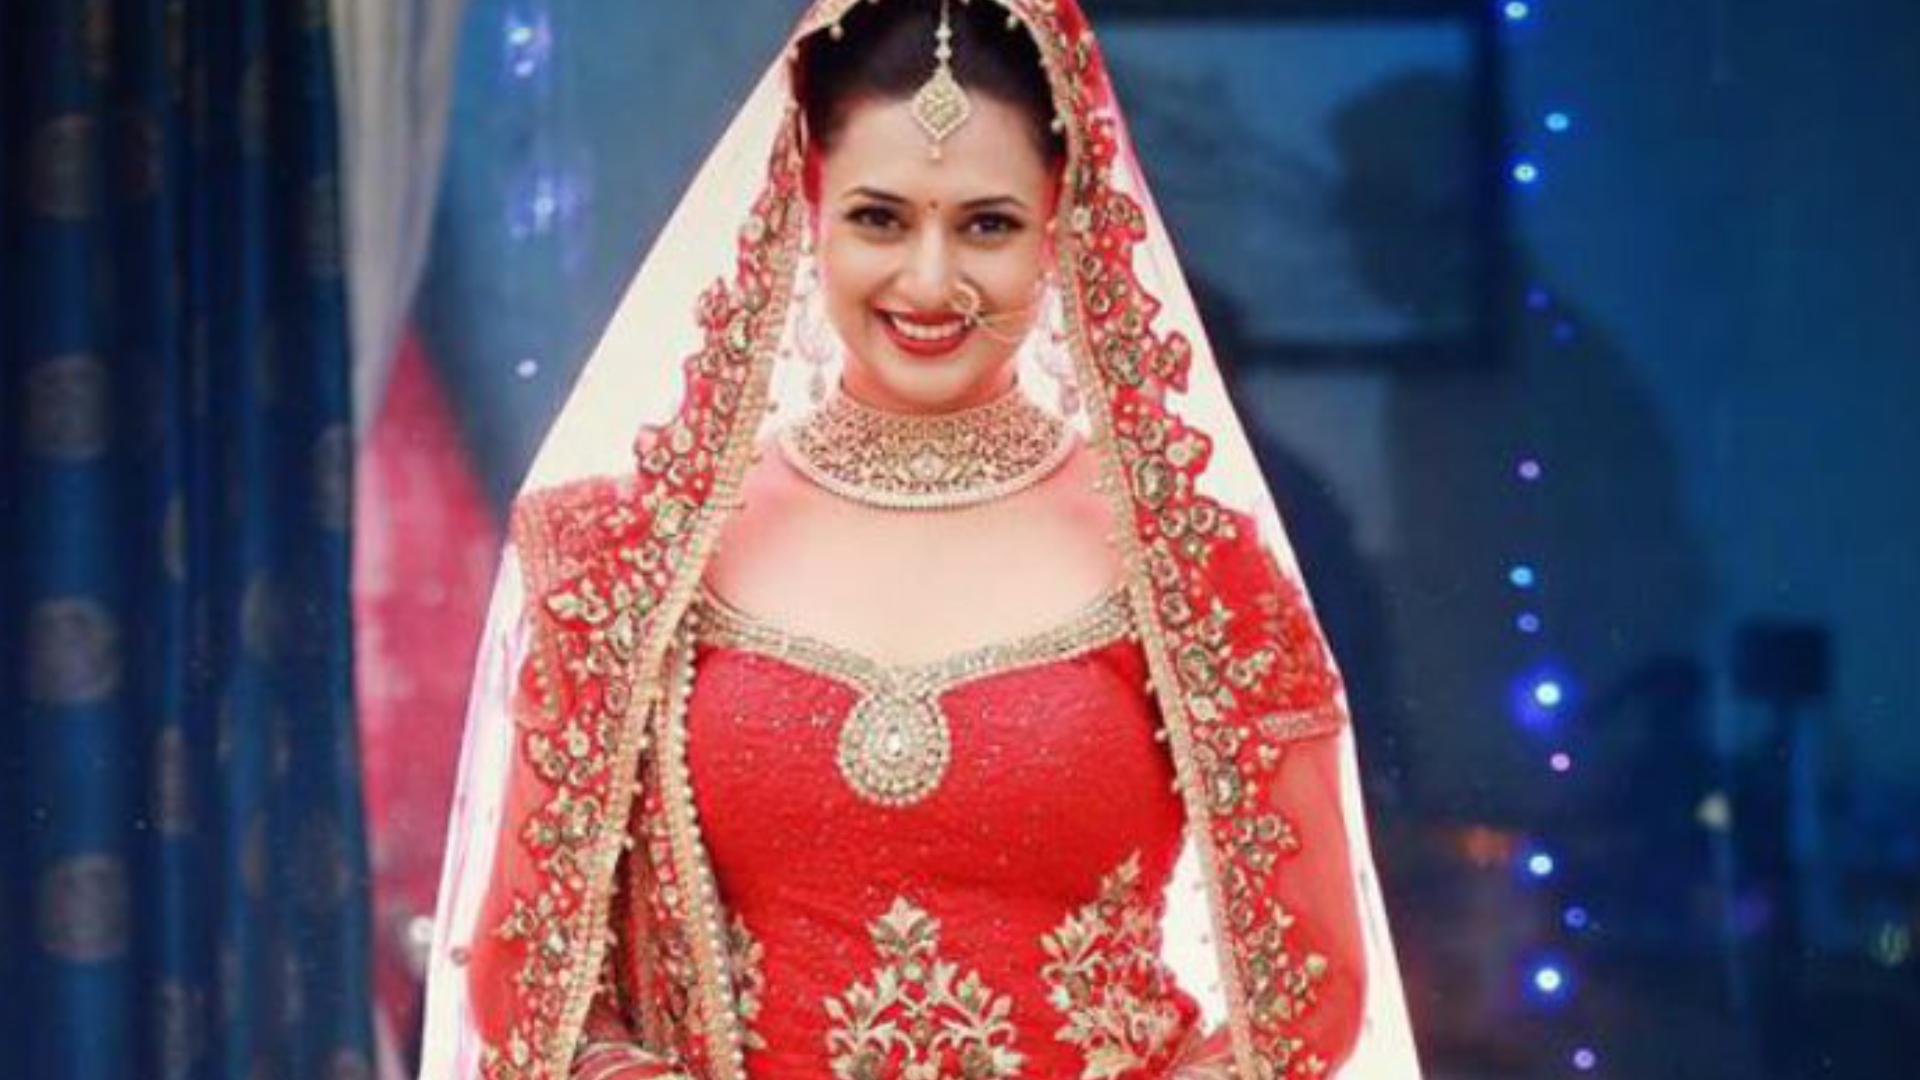 Divyanka Tripathi Wedding Beauty Tips For Brides Homemade Best